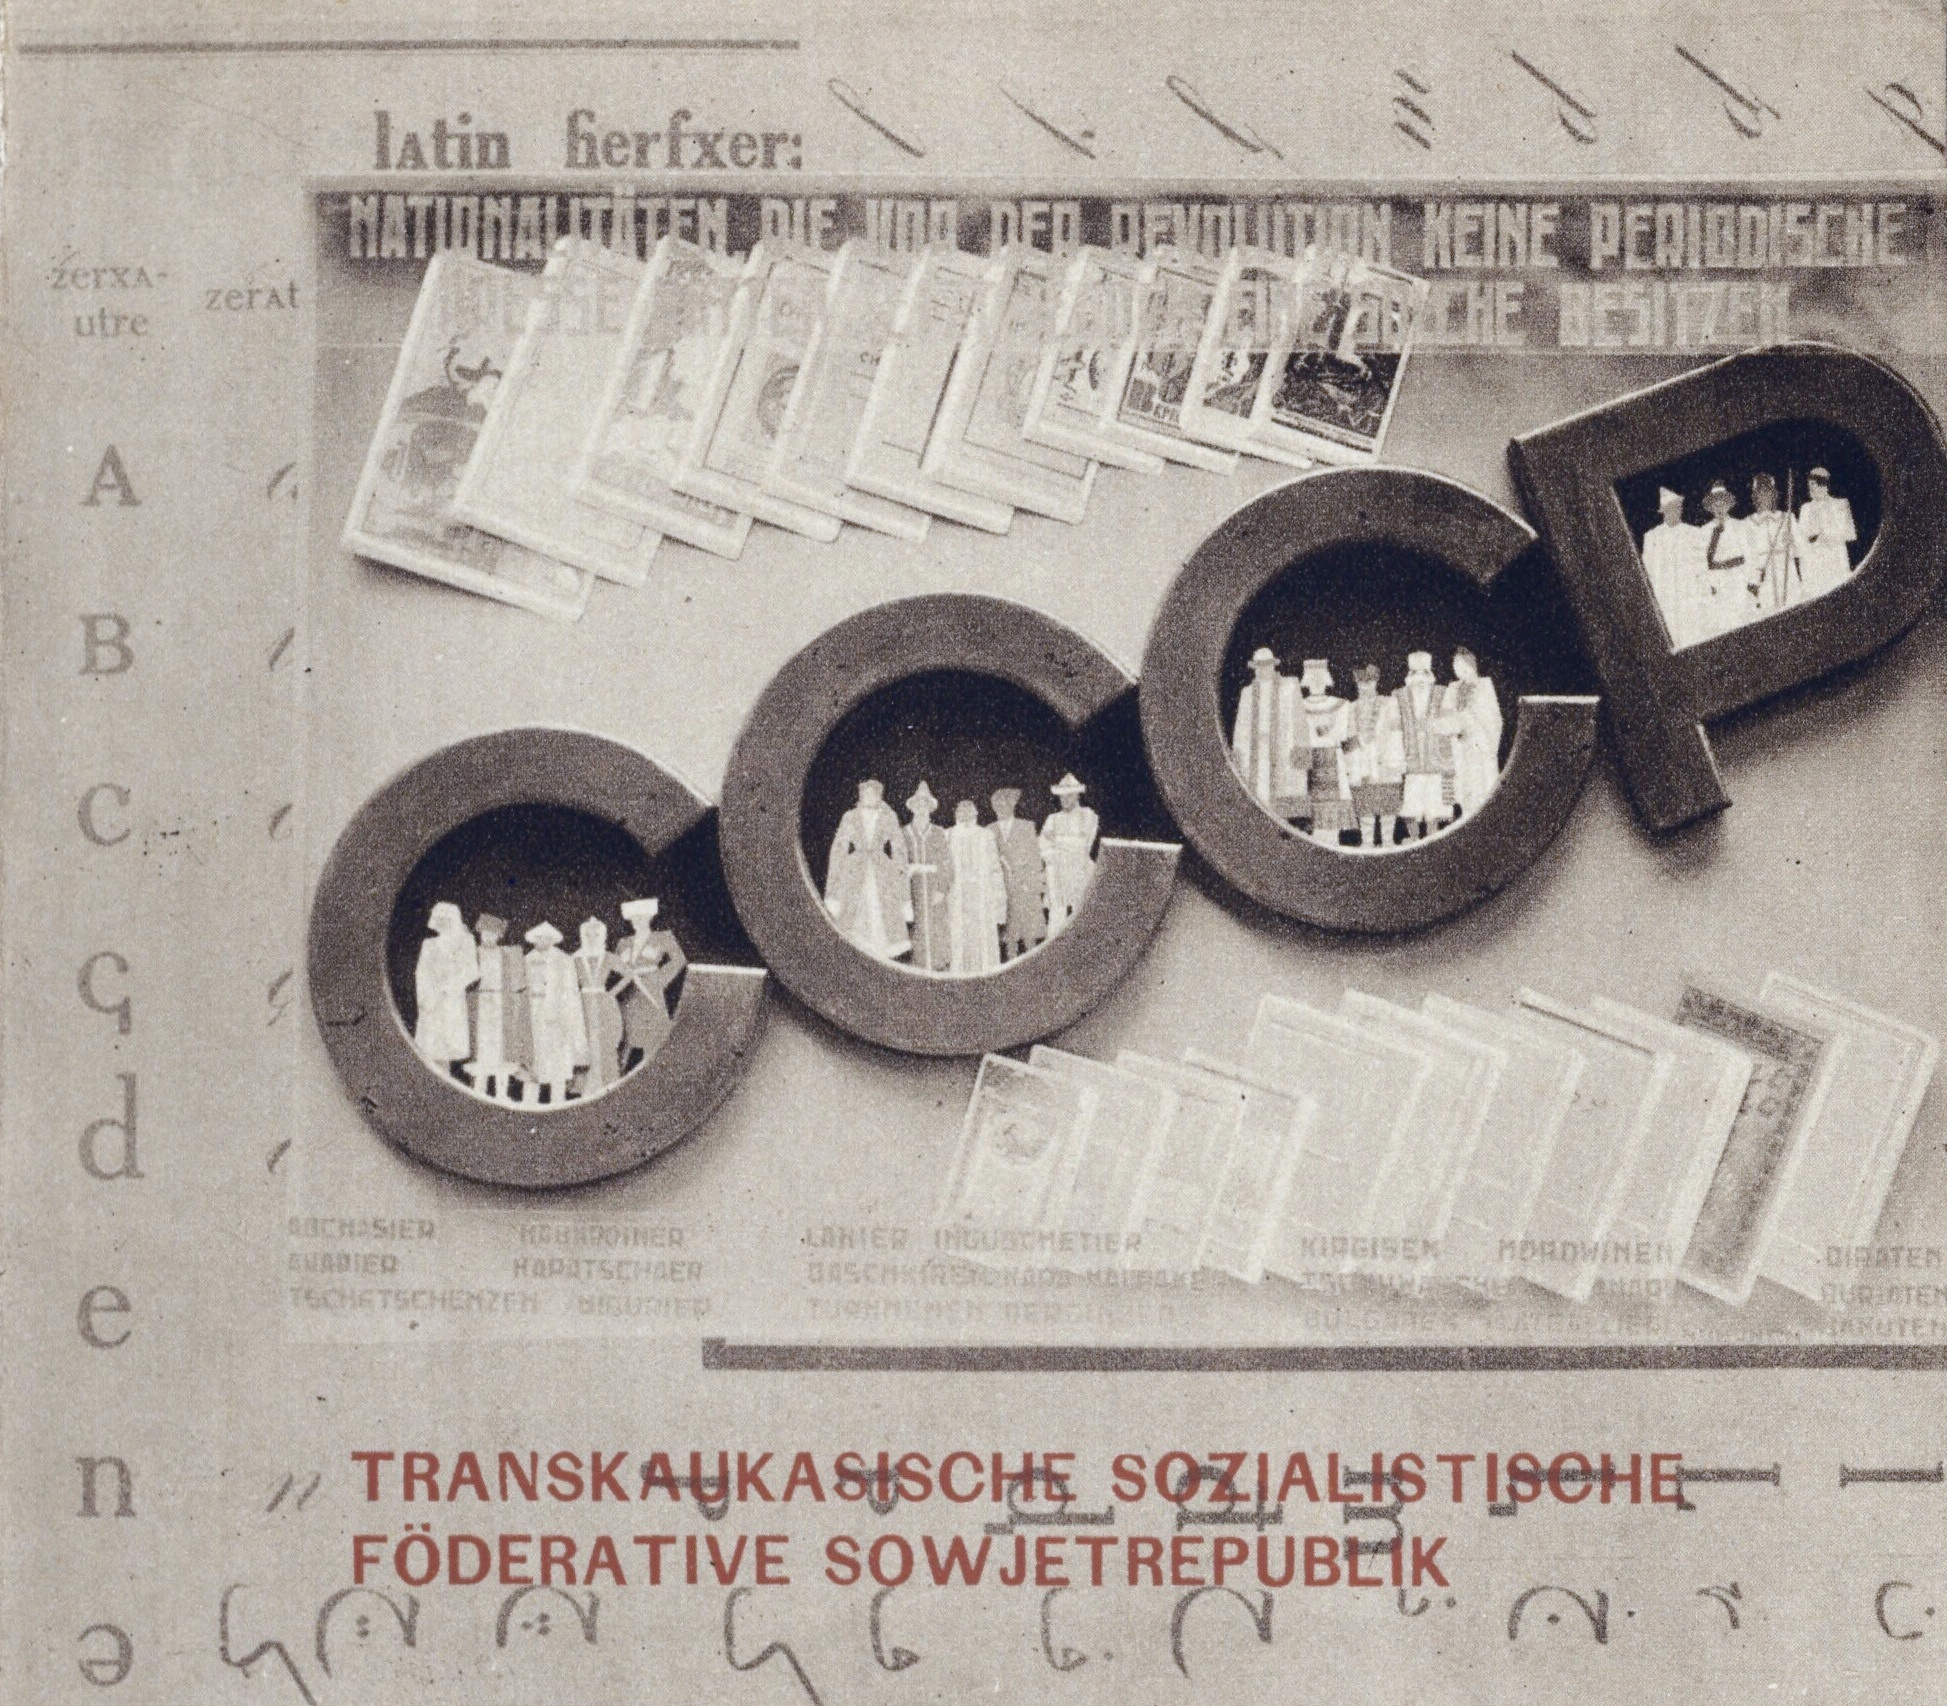 Katalog des Sowjet-Pavillons auf der Internationalen Presse-Ausstellung Köln 1928, pgs 15-17a1